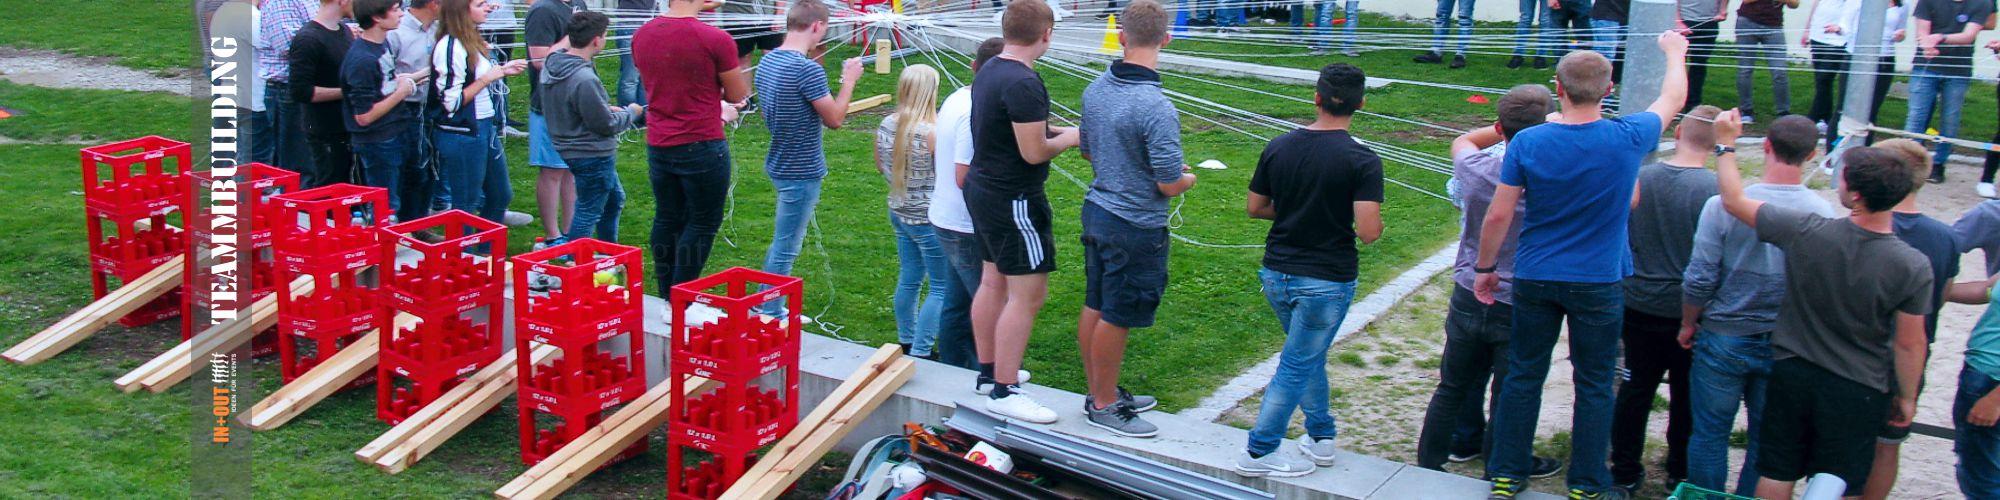 Ideen für Team Events - Azubi Camp - Team Event Koblenz